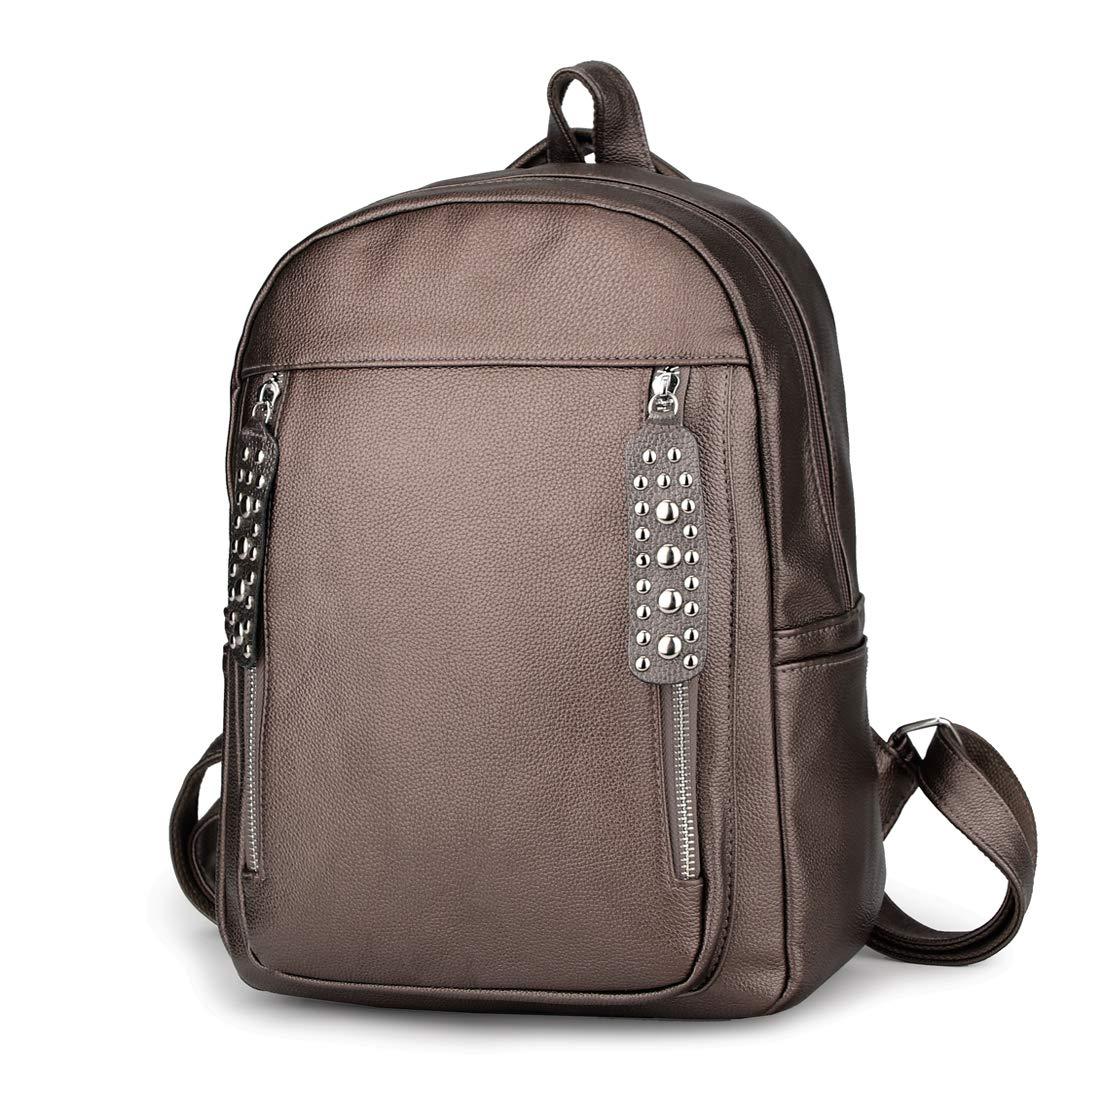 9f7c099ae062 Artwell Women Backpack Purse PU Leather Rivet Zipper Rucksack Lightweight  School Shoulder Bag for Girls (Bronze)